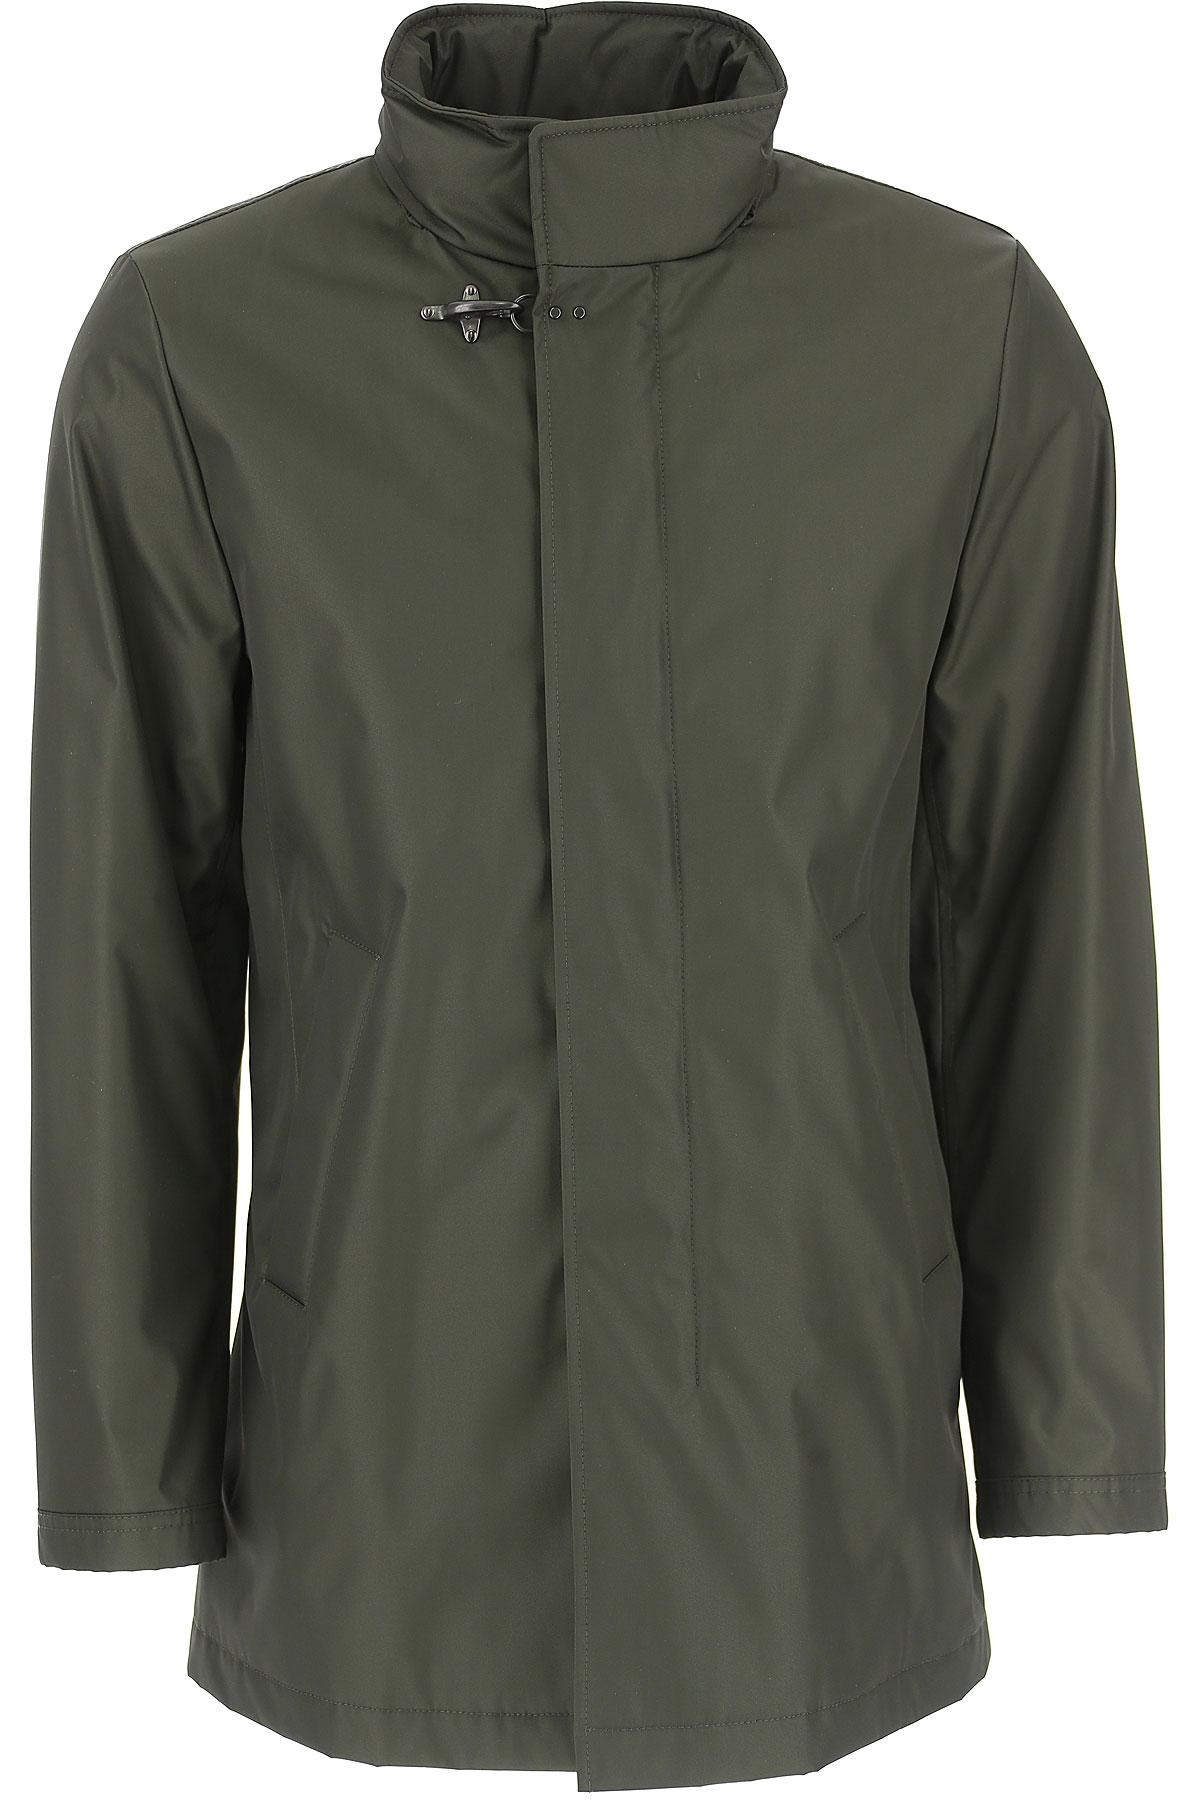 Image of Harris Wharf London Men\'s Coat, Black, Virgin wool, 2017, L M S